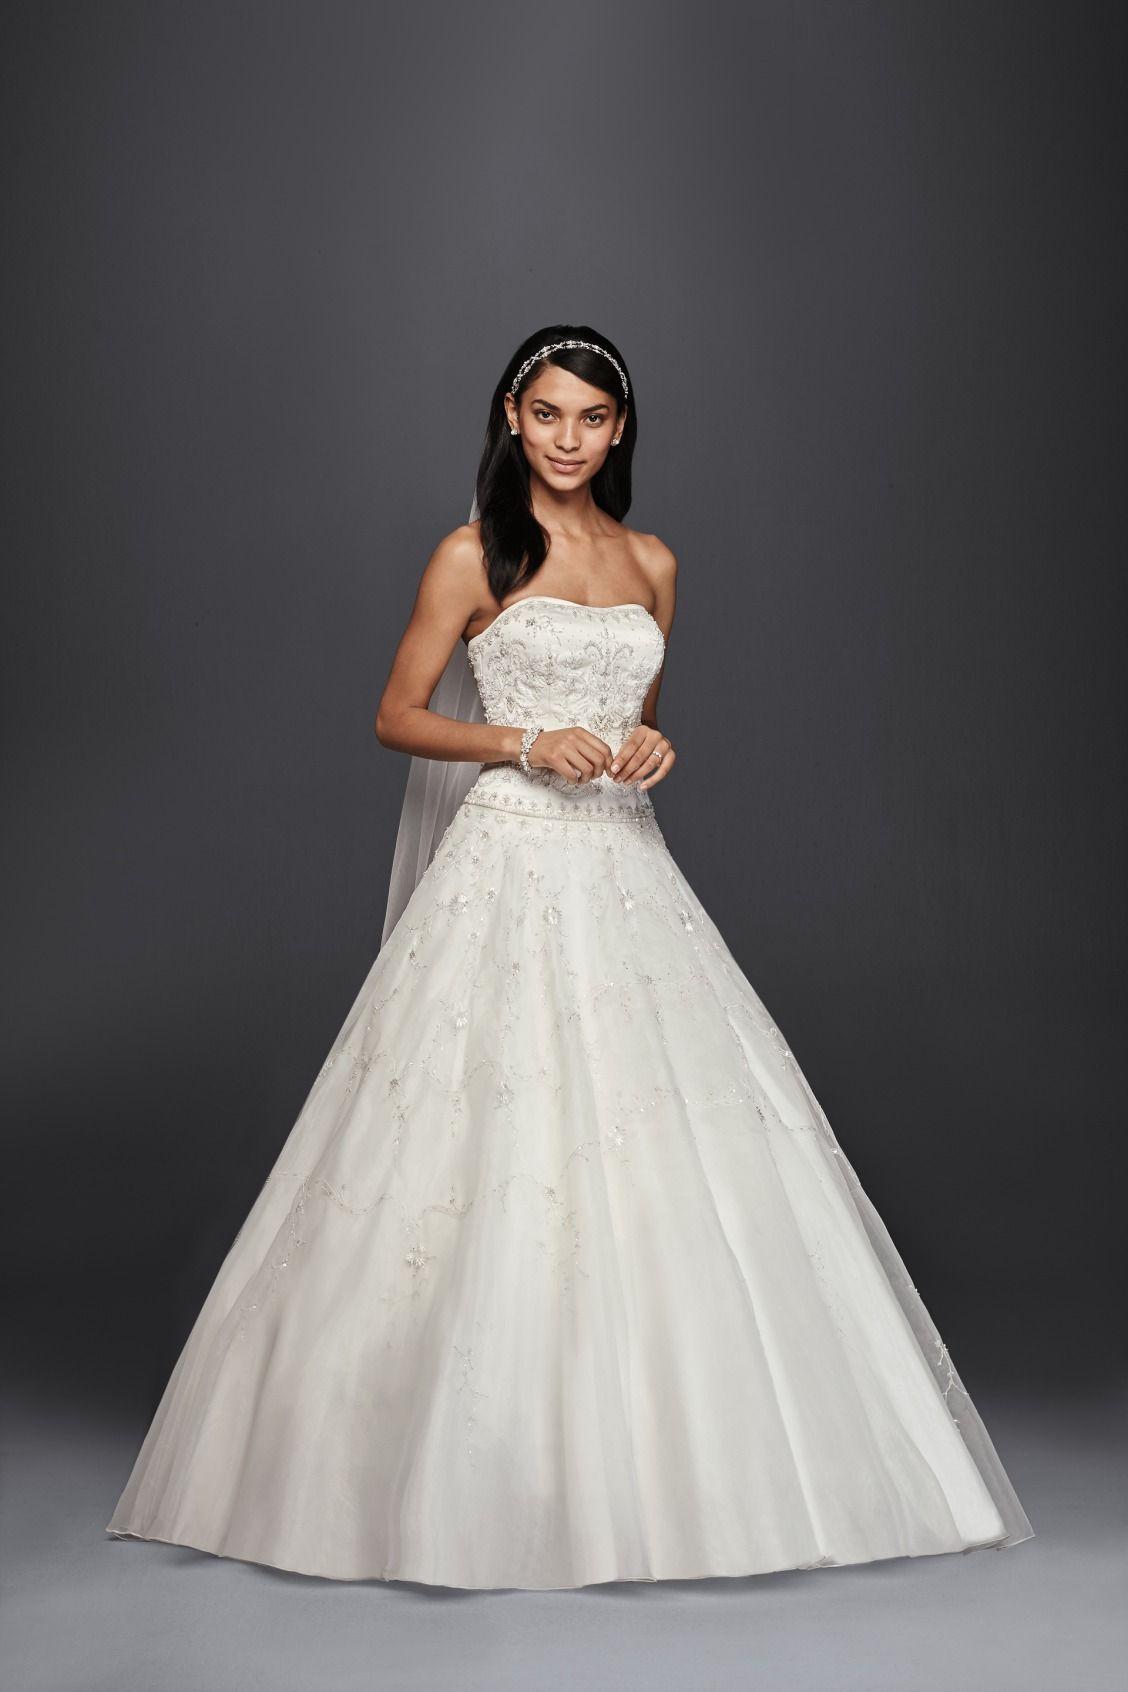 Ball gowns wedding dresses  Oleg Cassini Satin Bodice Organza Ball Gown Wedding Dress available